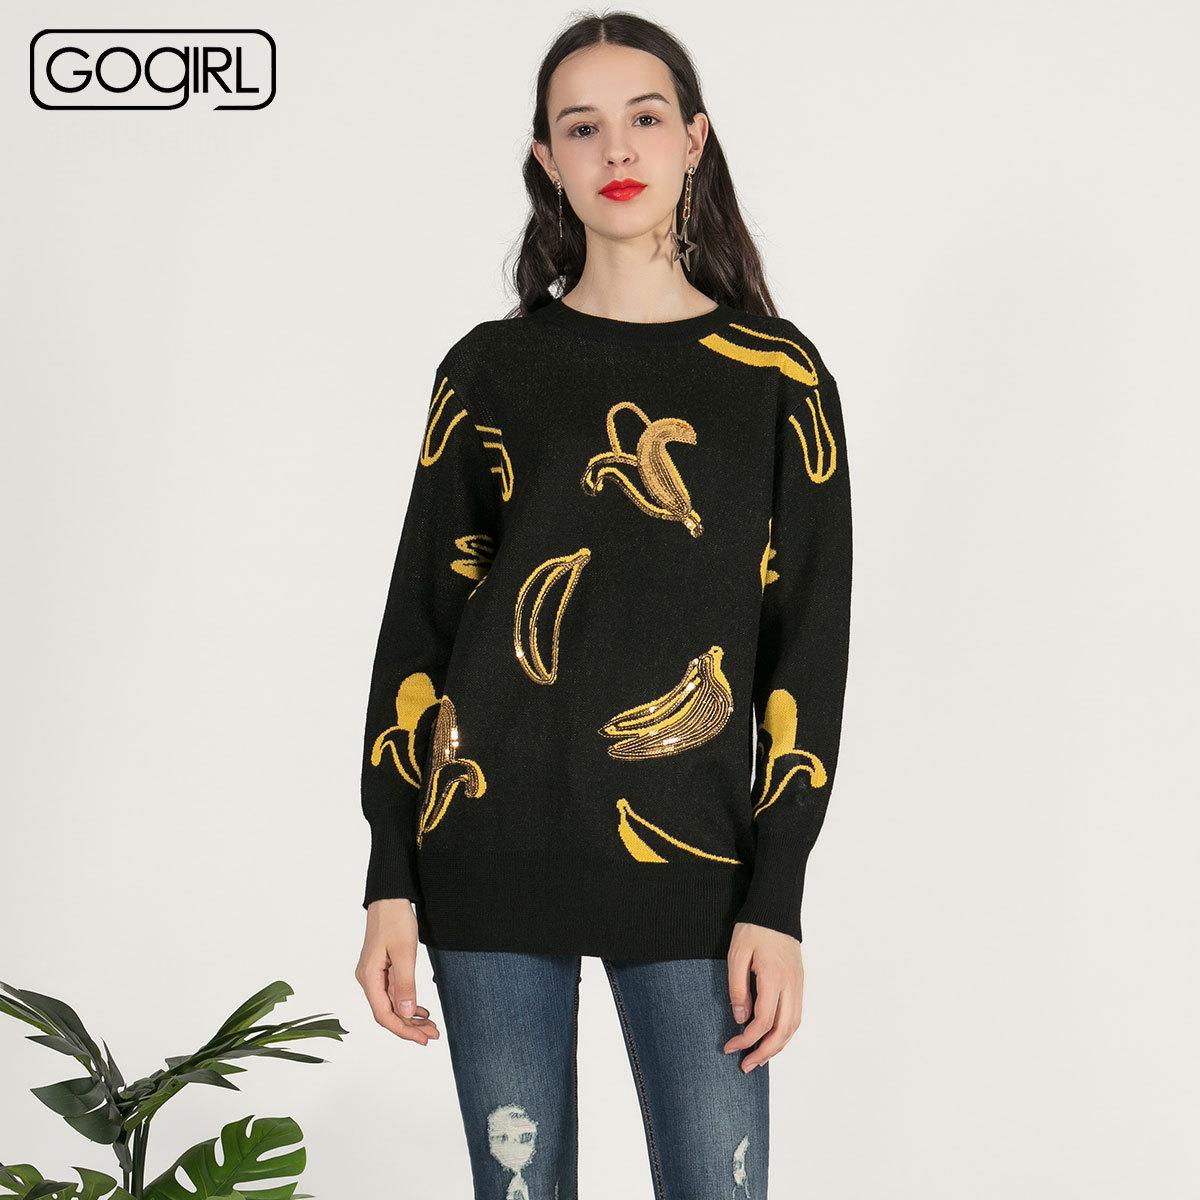 GOGIRL绣花圆领新款专柜亮片高歌套头毛衣针织衫时尚女GUGU44KK5555